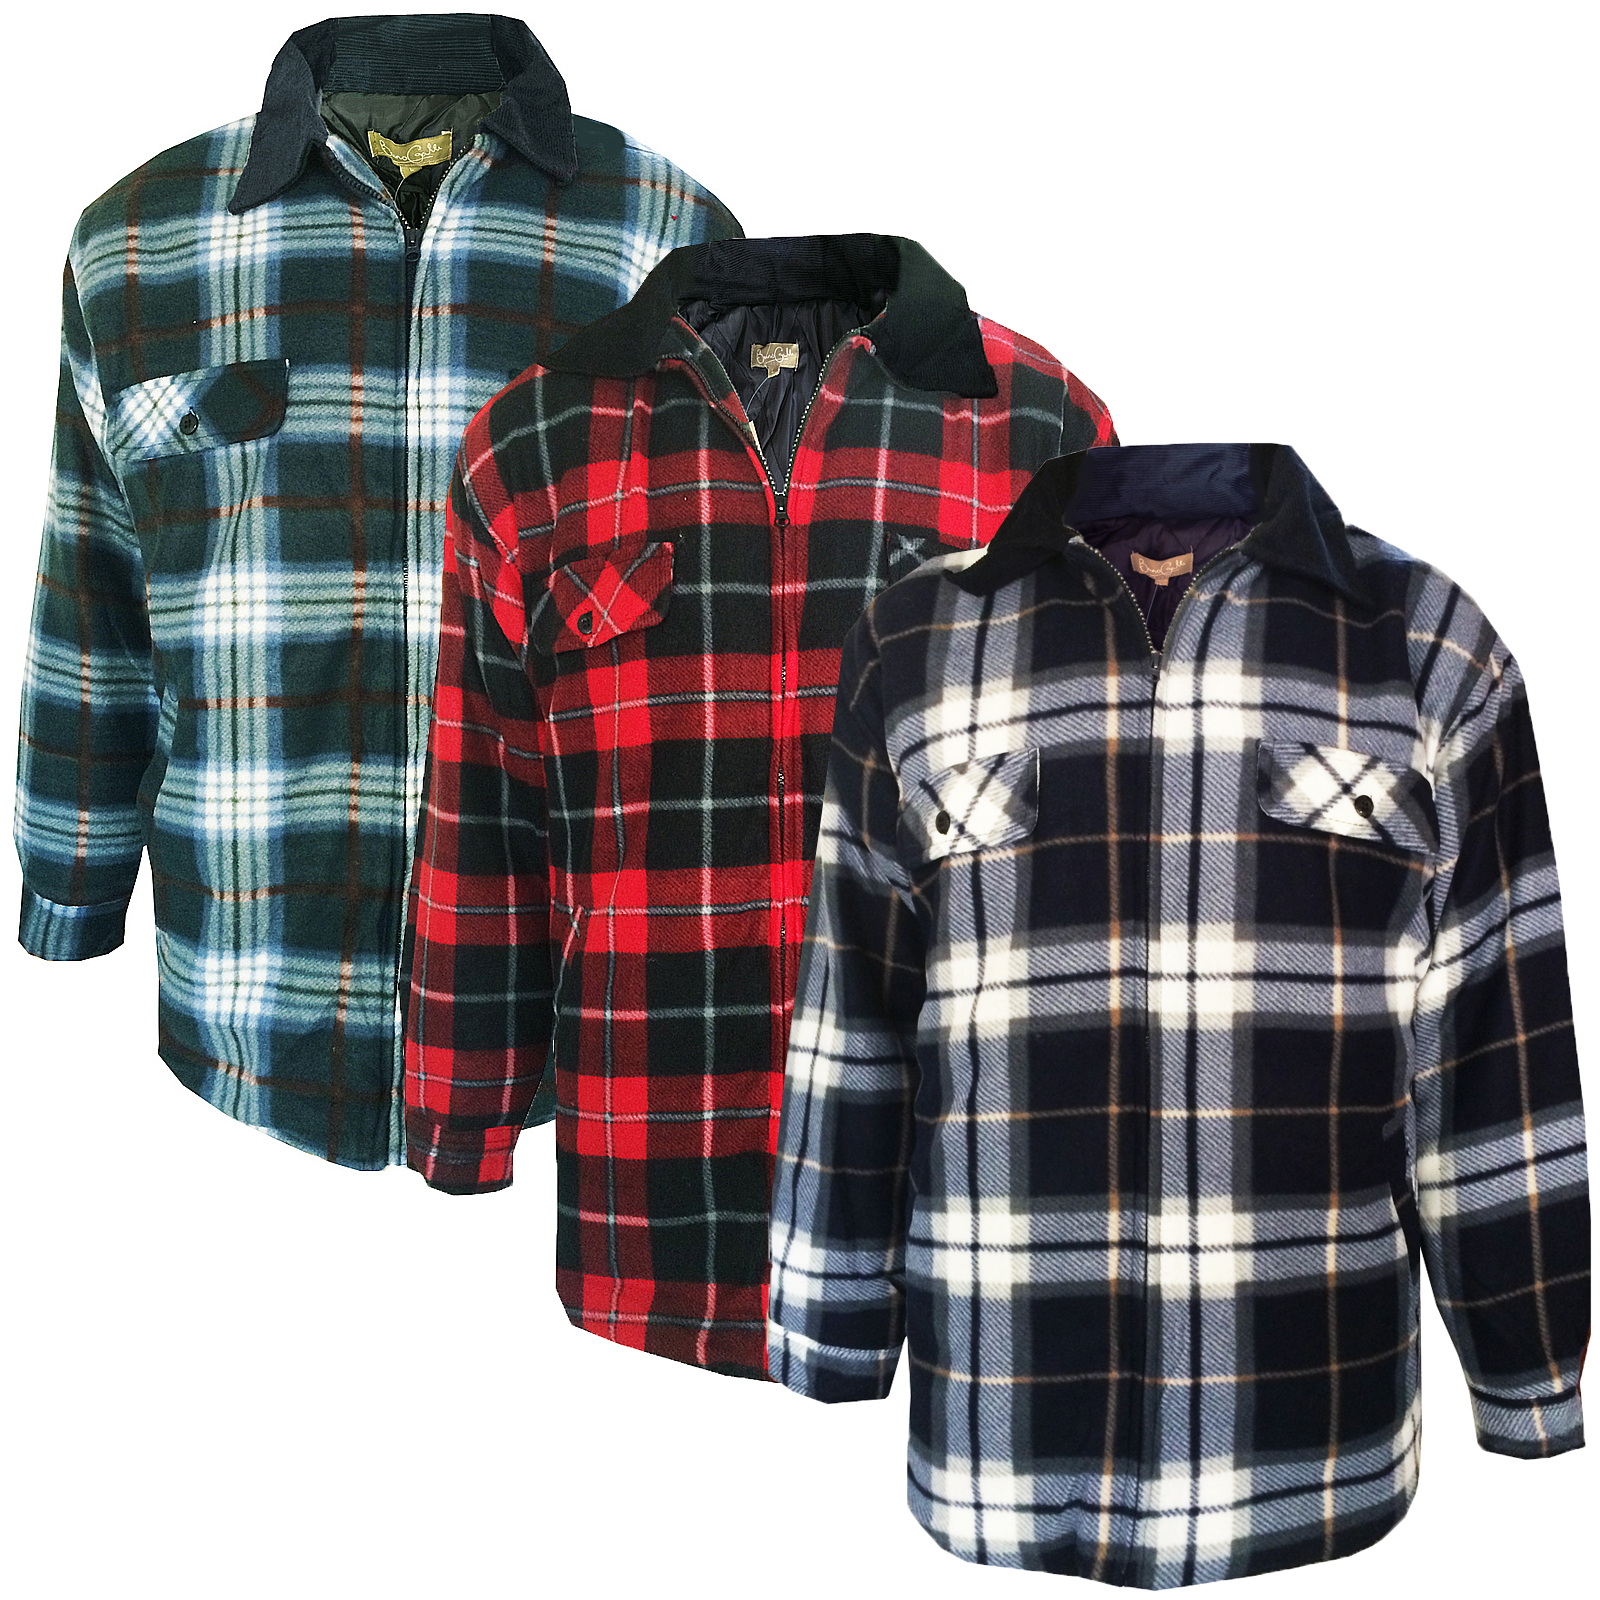 Mens Lumberjack Fleece Jacket Bruno Galli Extra Thick Padded ...